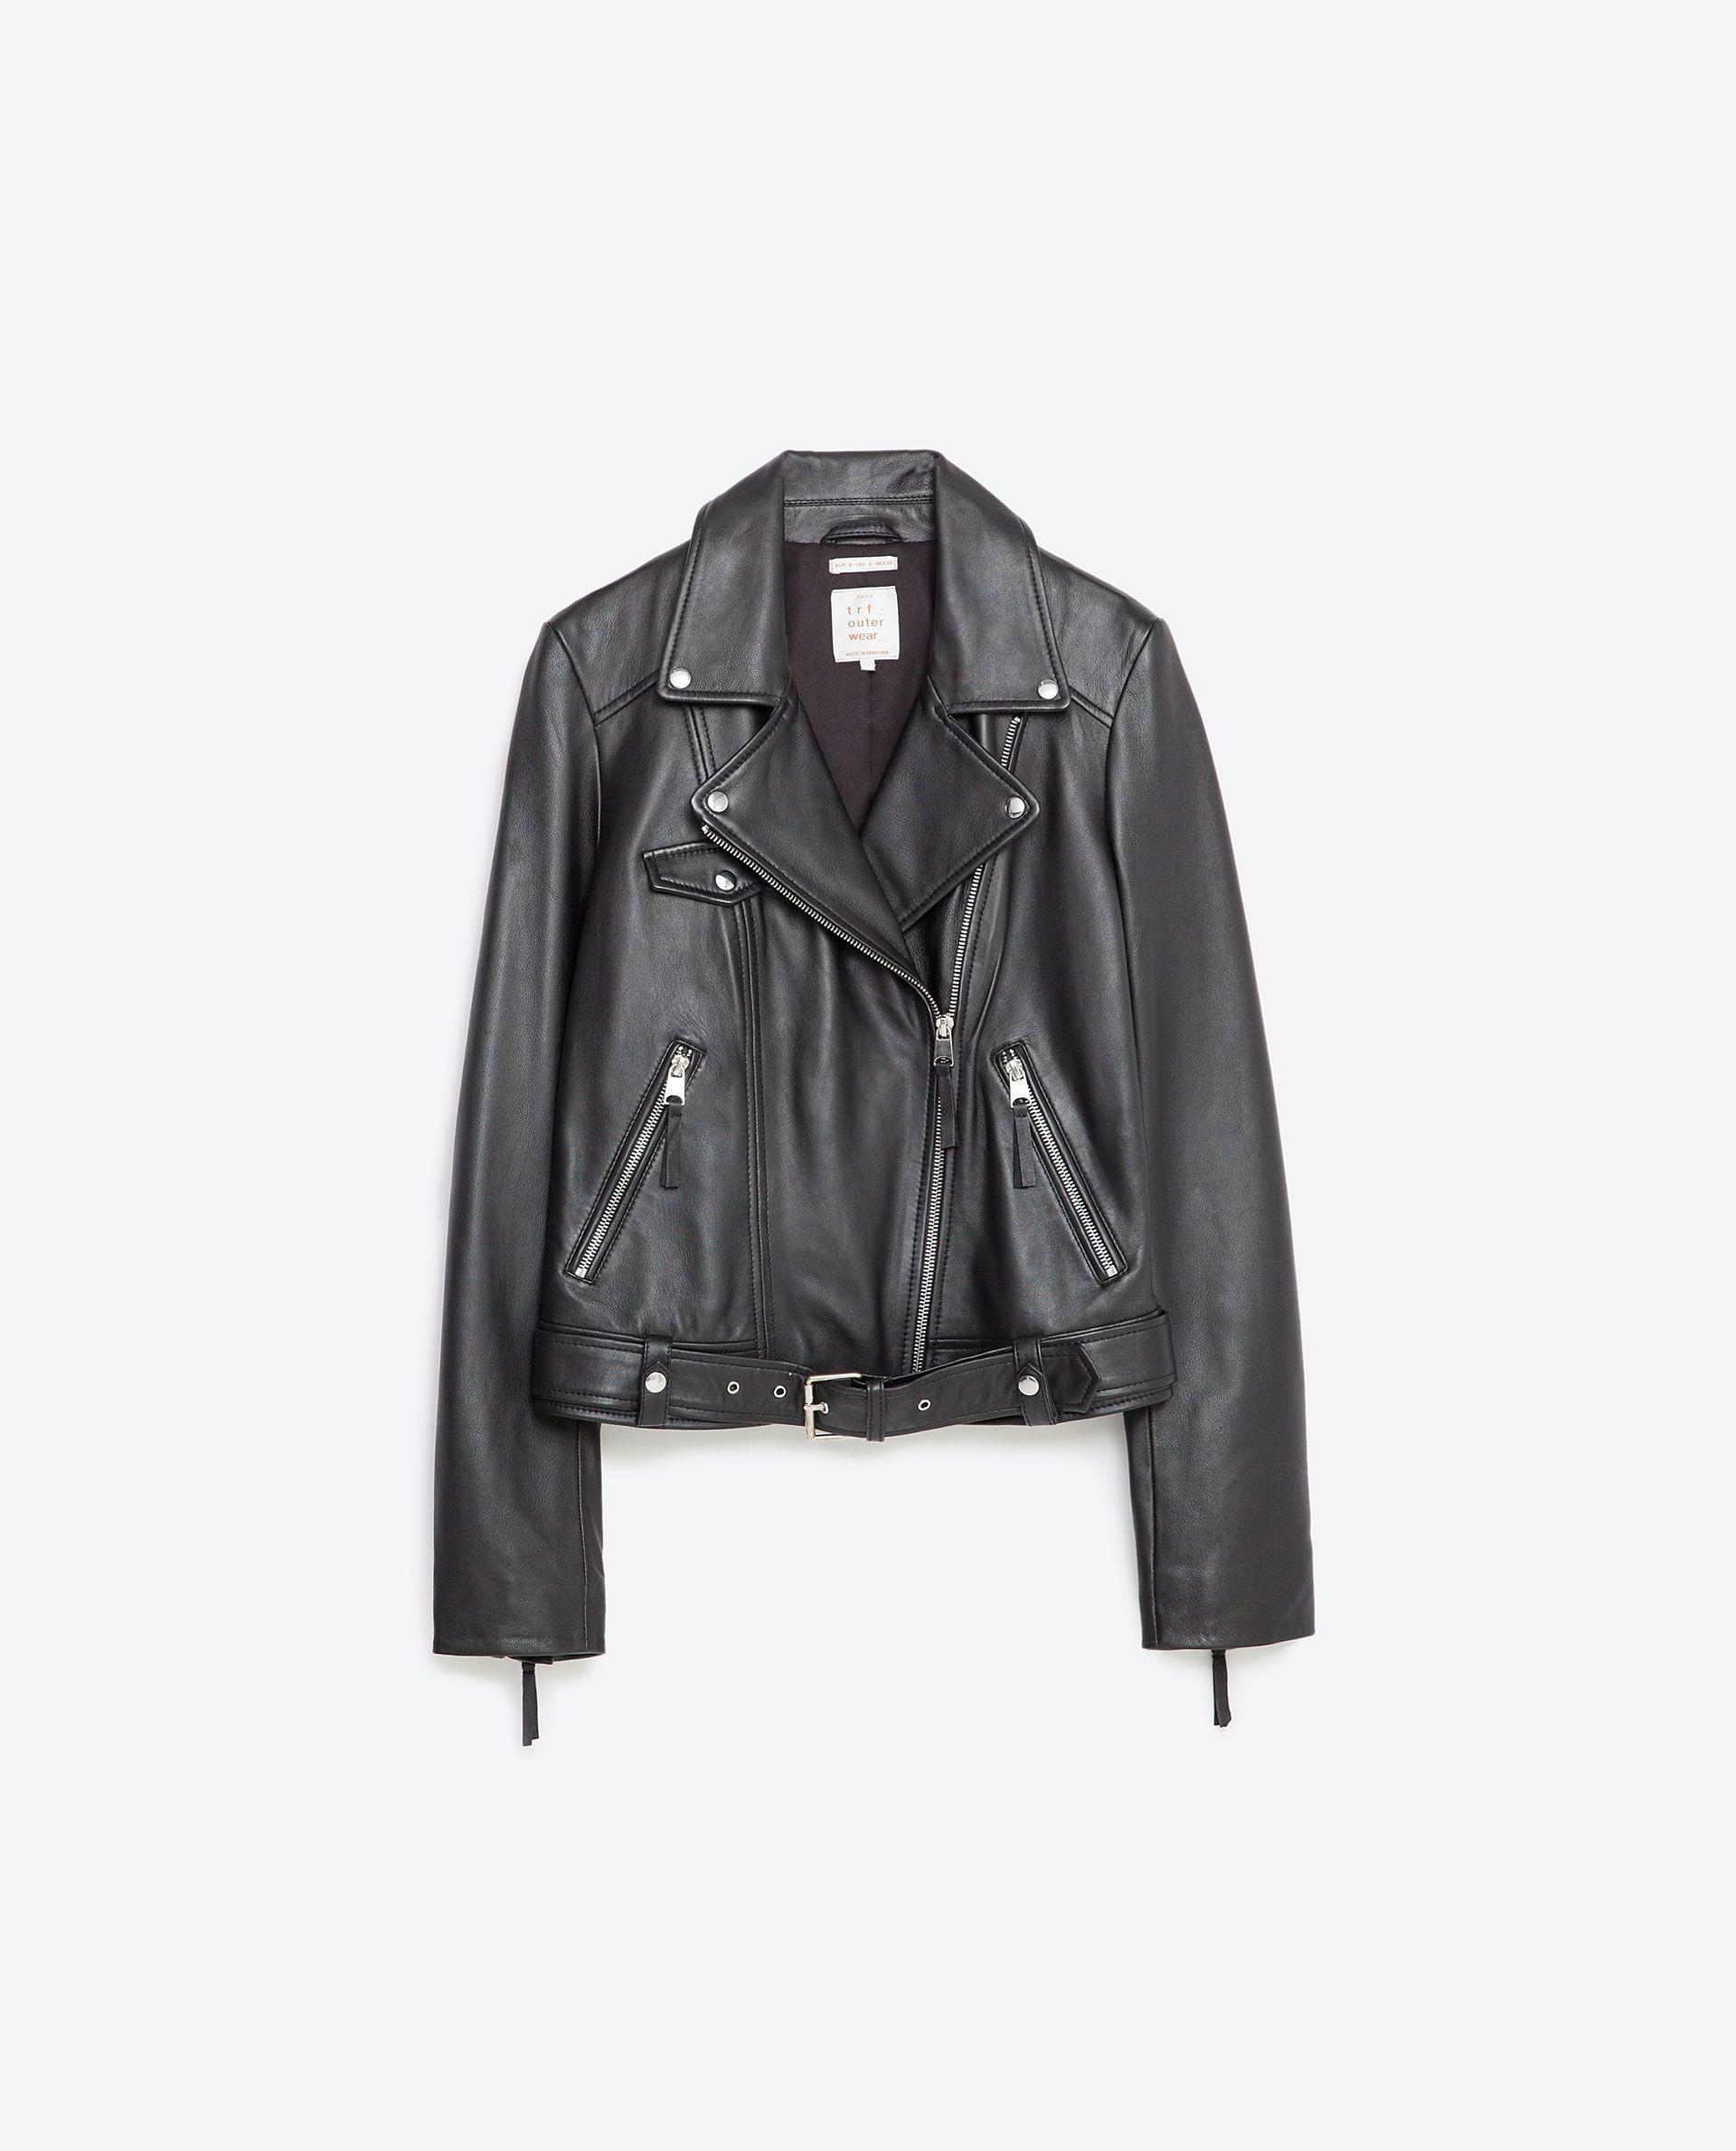 Basic Leather Jacket Trf New In Zara Leather Jacket Leather Jacket Black Leather Jackets Women [ 2379 x 1920 Pixel ]